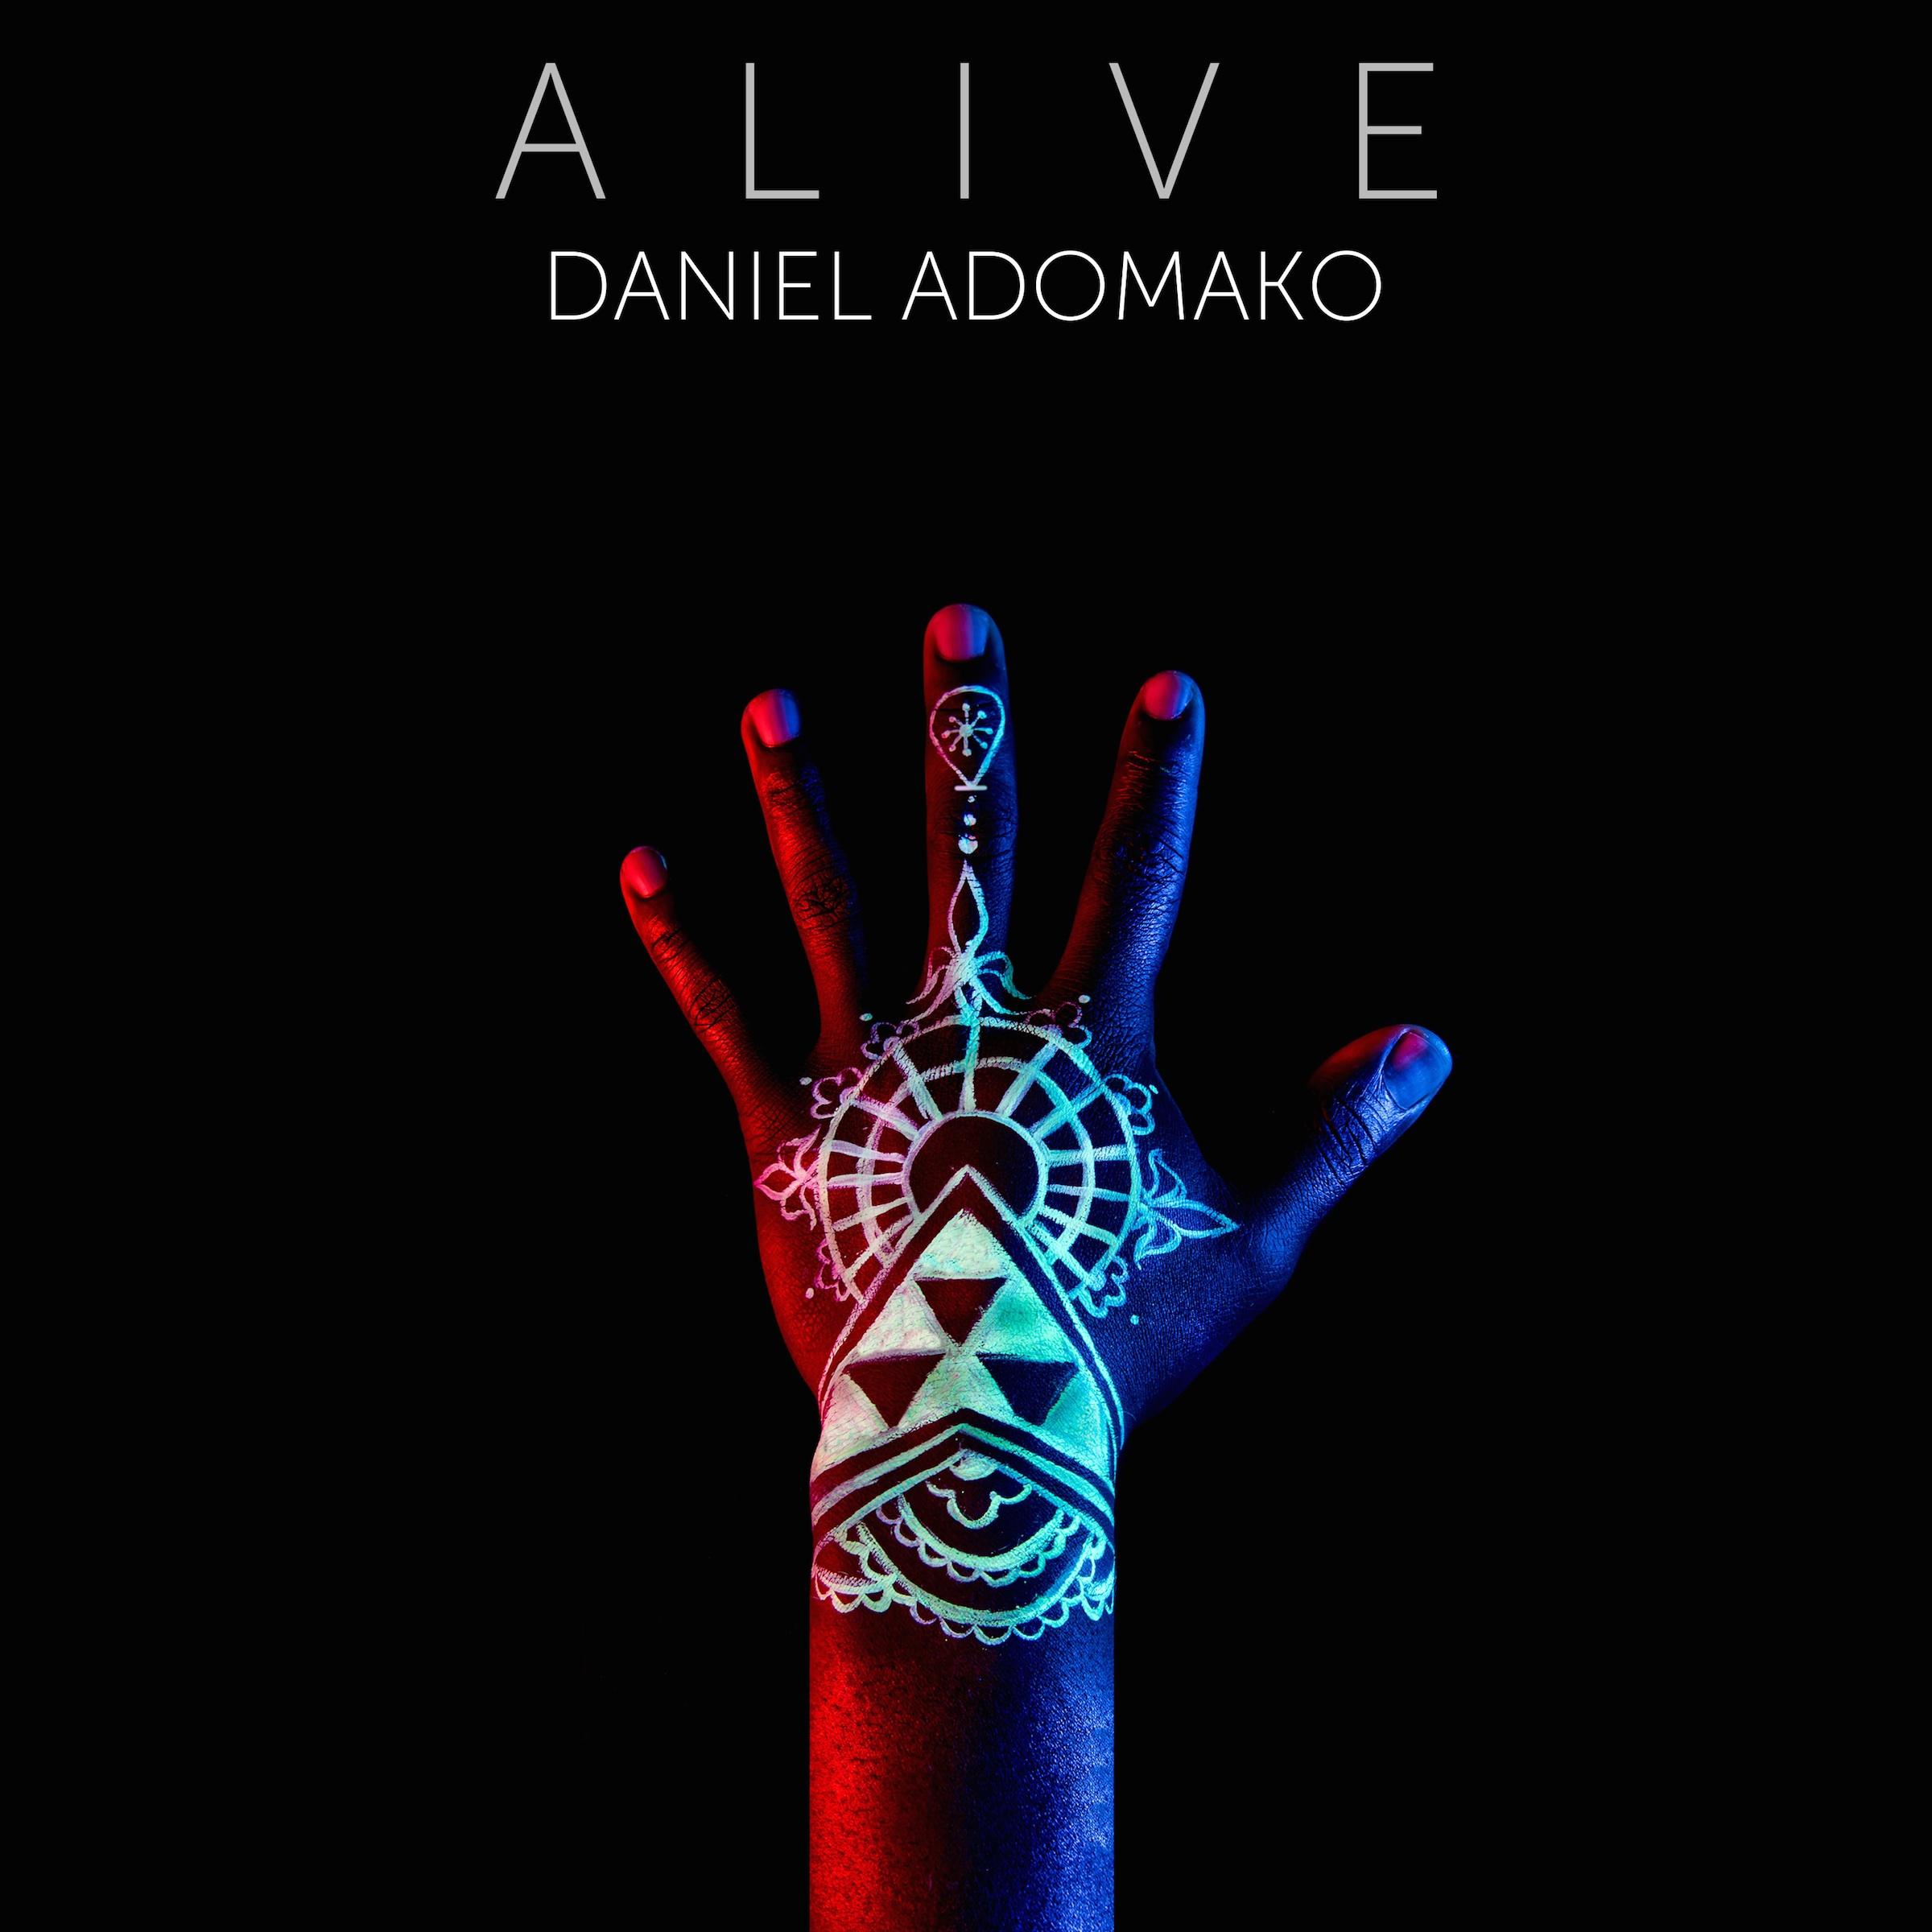 Daniel Adomako - Alive (Santi Vasques Remix)